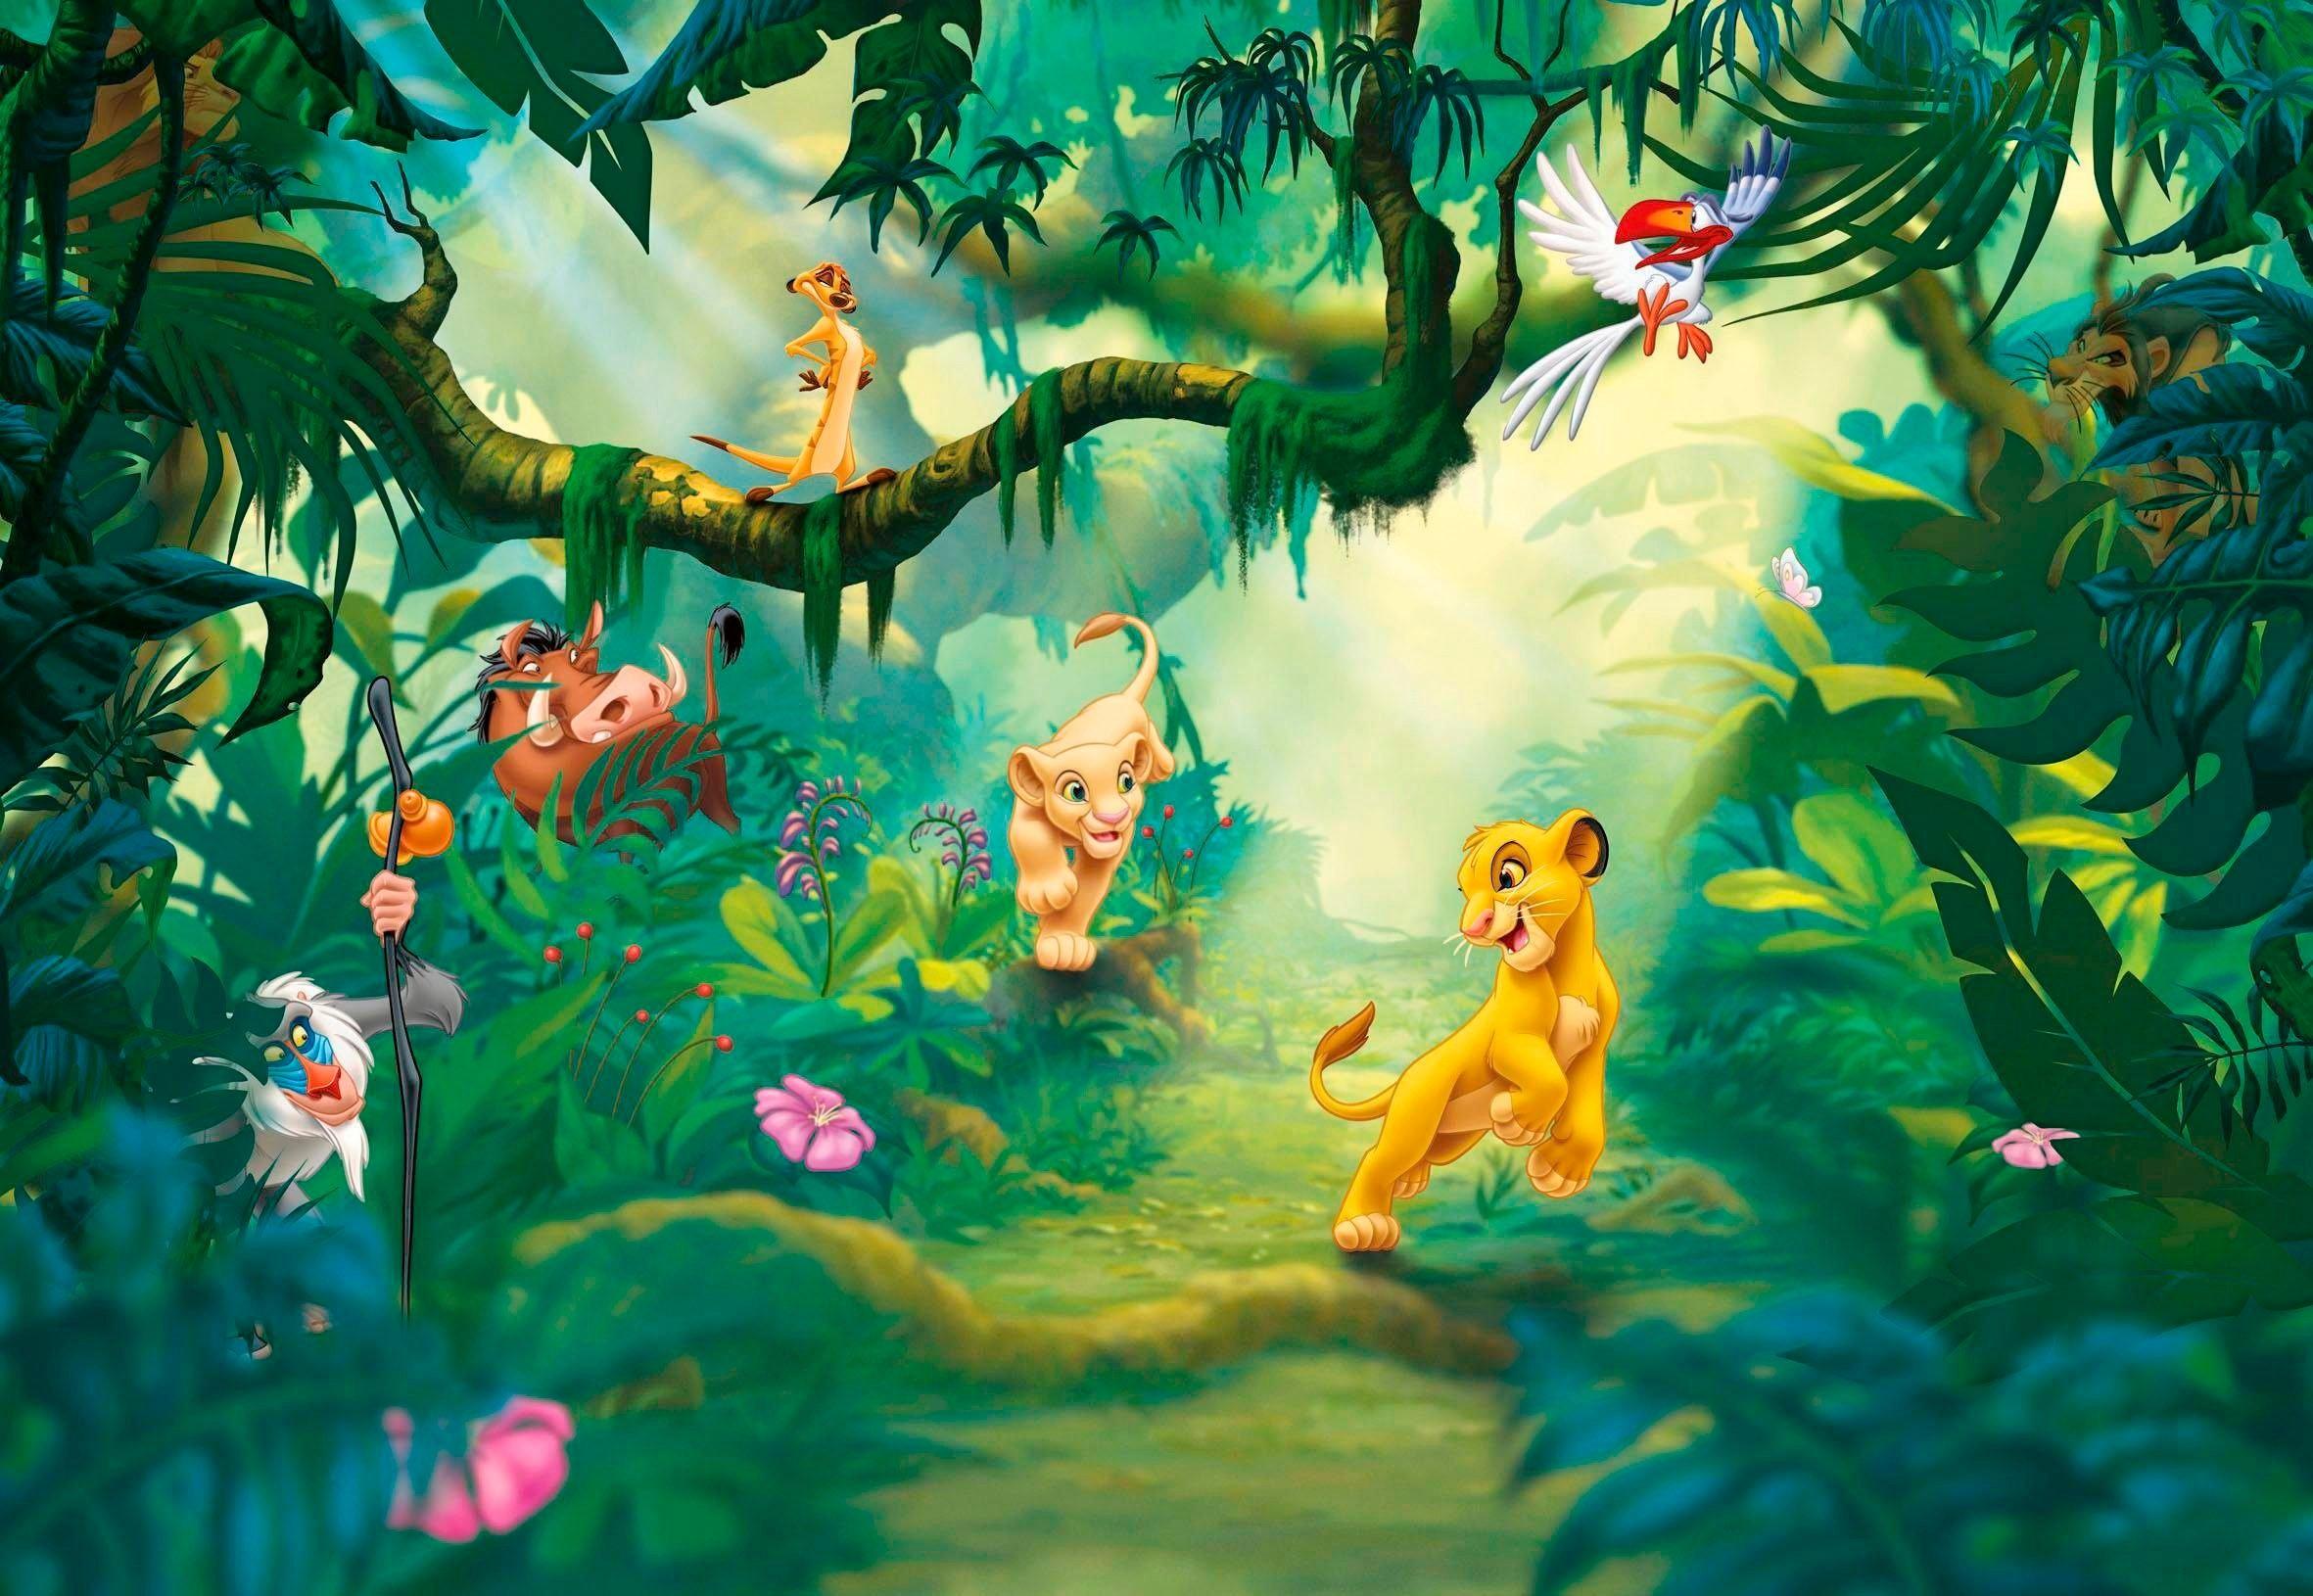 Komar fotobehang »Papiertapete Lion King Jungle« bij OTTO online kopen